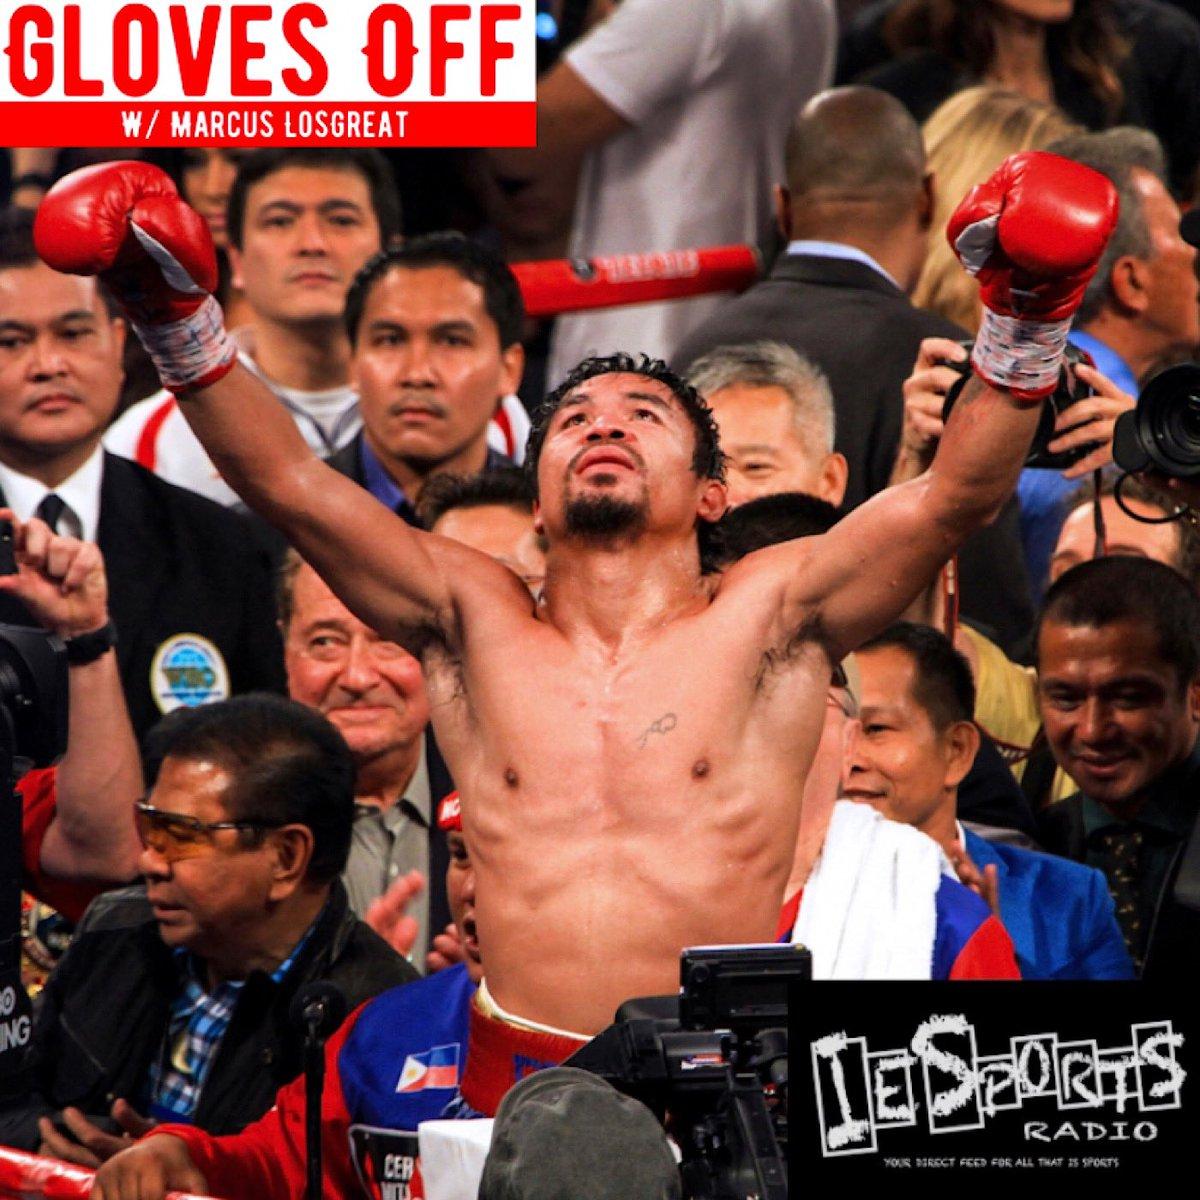 Next Up: TUE 7/7 7pm PST/10pm EST #GlovesOff with @MLosgreat #MMA #UFC #UFCFightIsland #InAbuDhabi #UFC251 #Boxing #GlovesOffBoxing @glovesoffboxing https://t.co/K8nR5KMEmE https://t.co/XVX88FzJNe